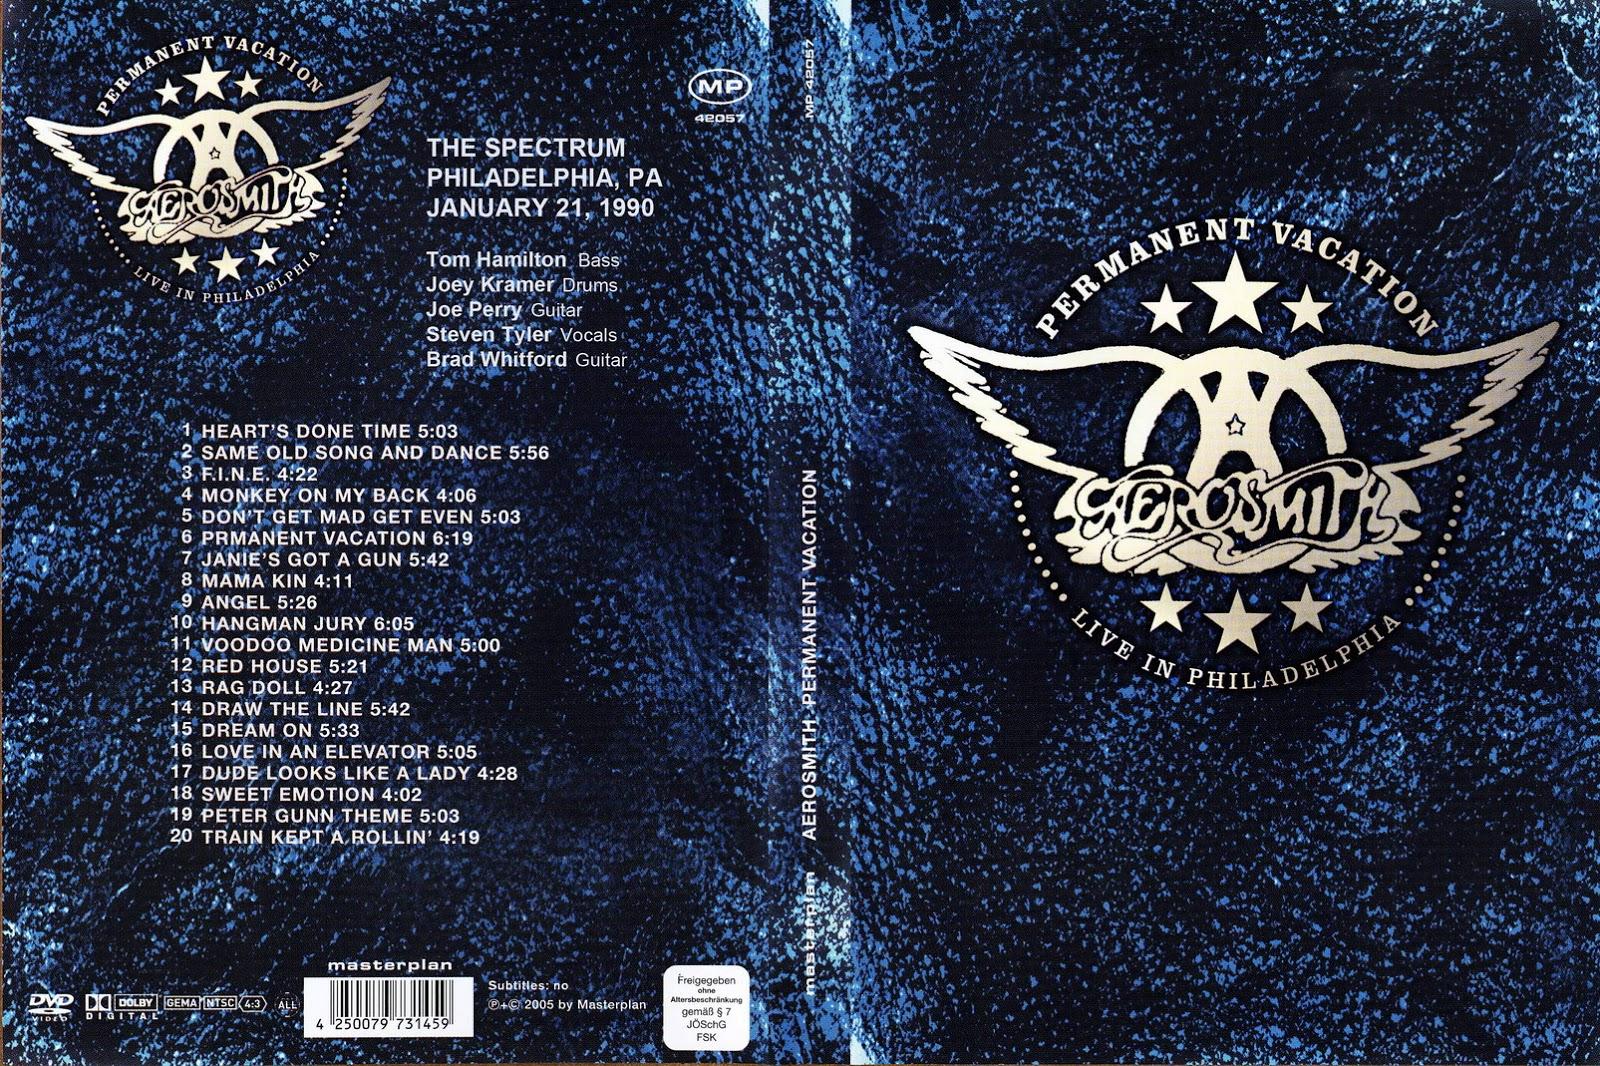 Plumdusty s page pink floyd 1975 06 12 spectrum theater philadelphia - Aerosmith 1990 01 21 Philadelphia Pa 2xdvdfull Pro Shot